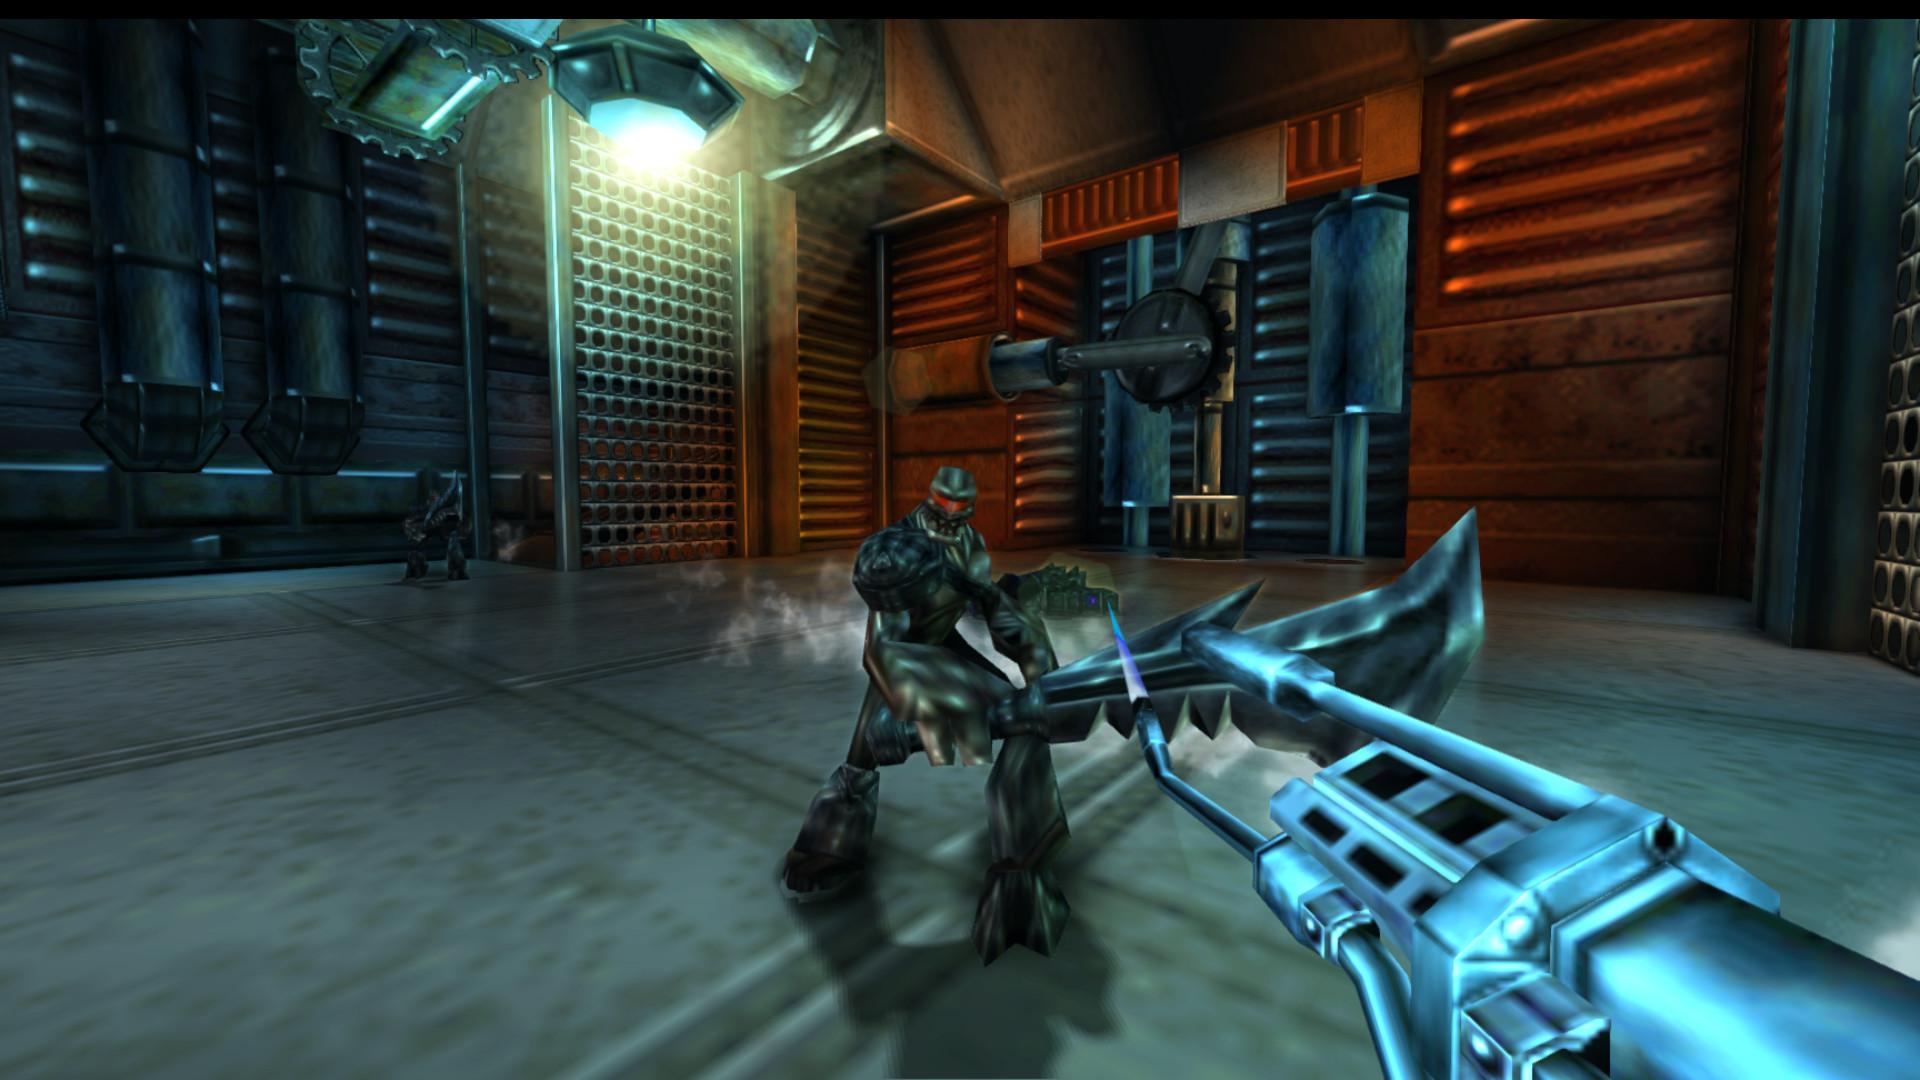 Turok 2: Seeds of Evil Screenshot 2